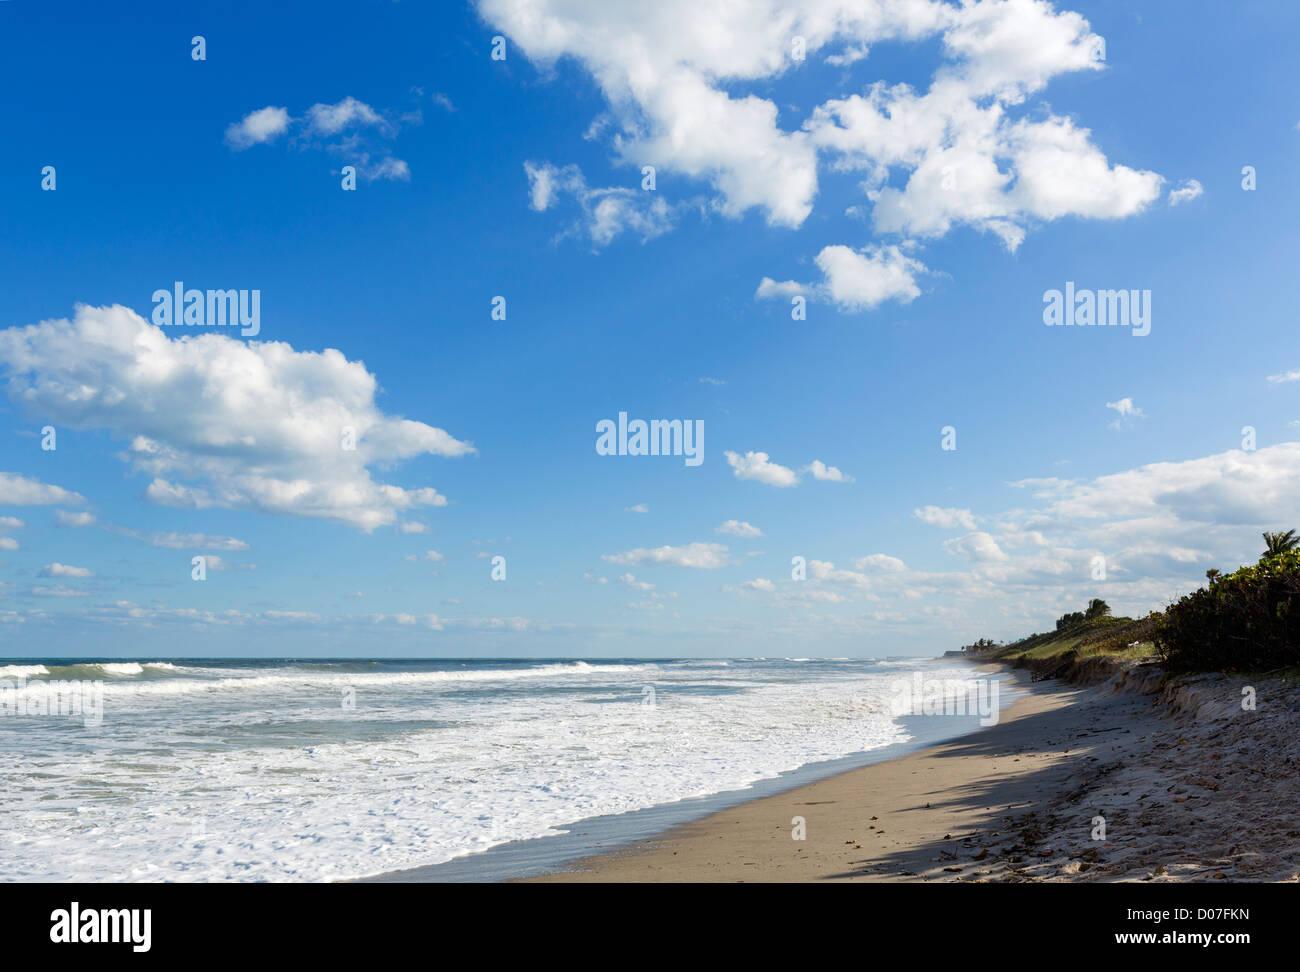 Beach in Jupiter, Treasure Coast, Florida, USA - Stock Image